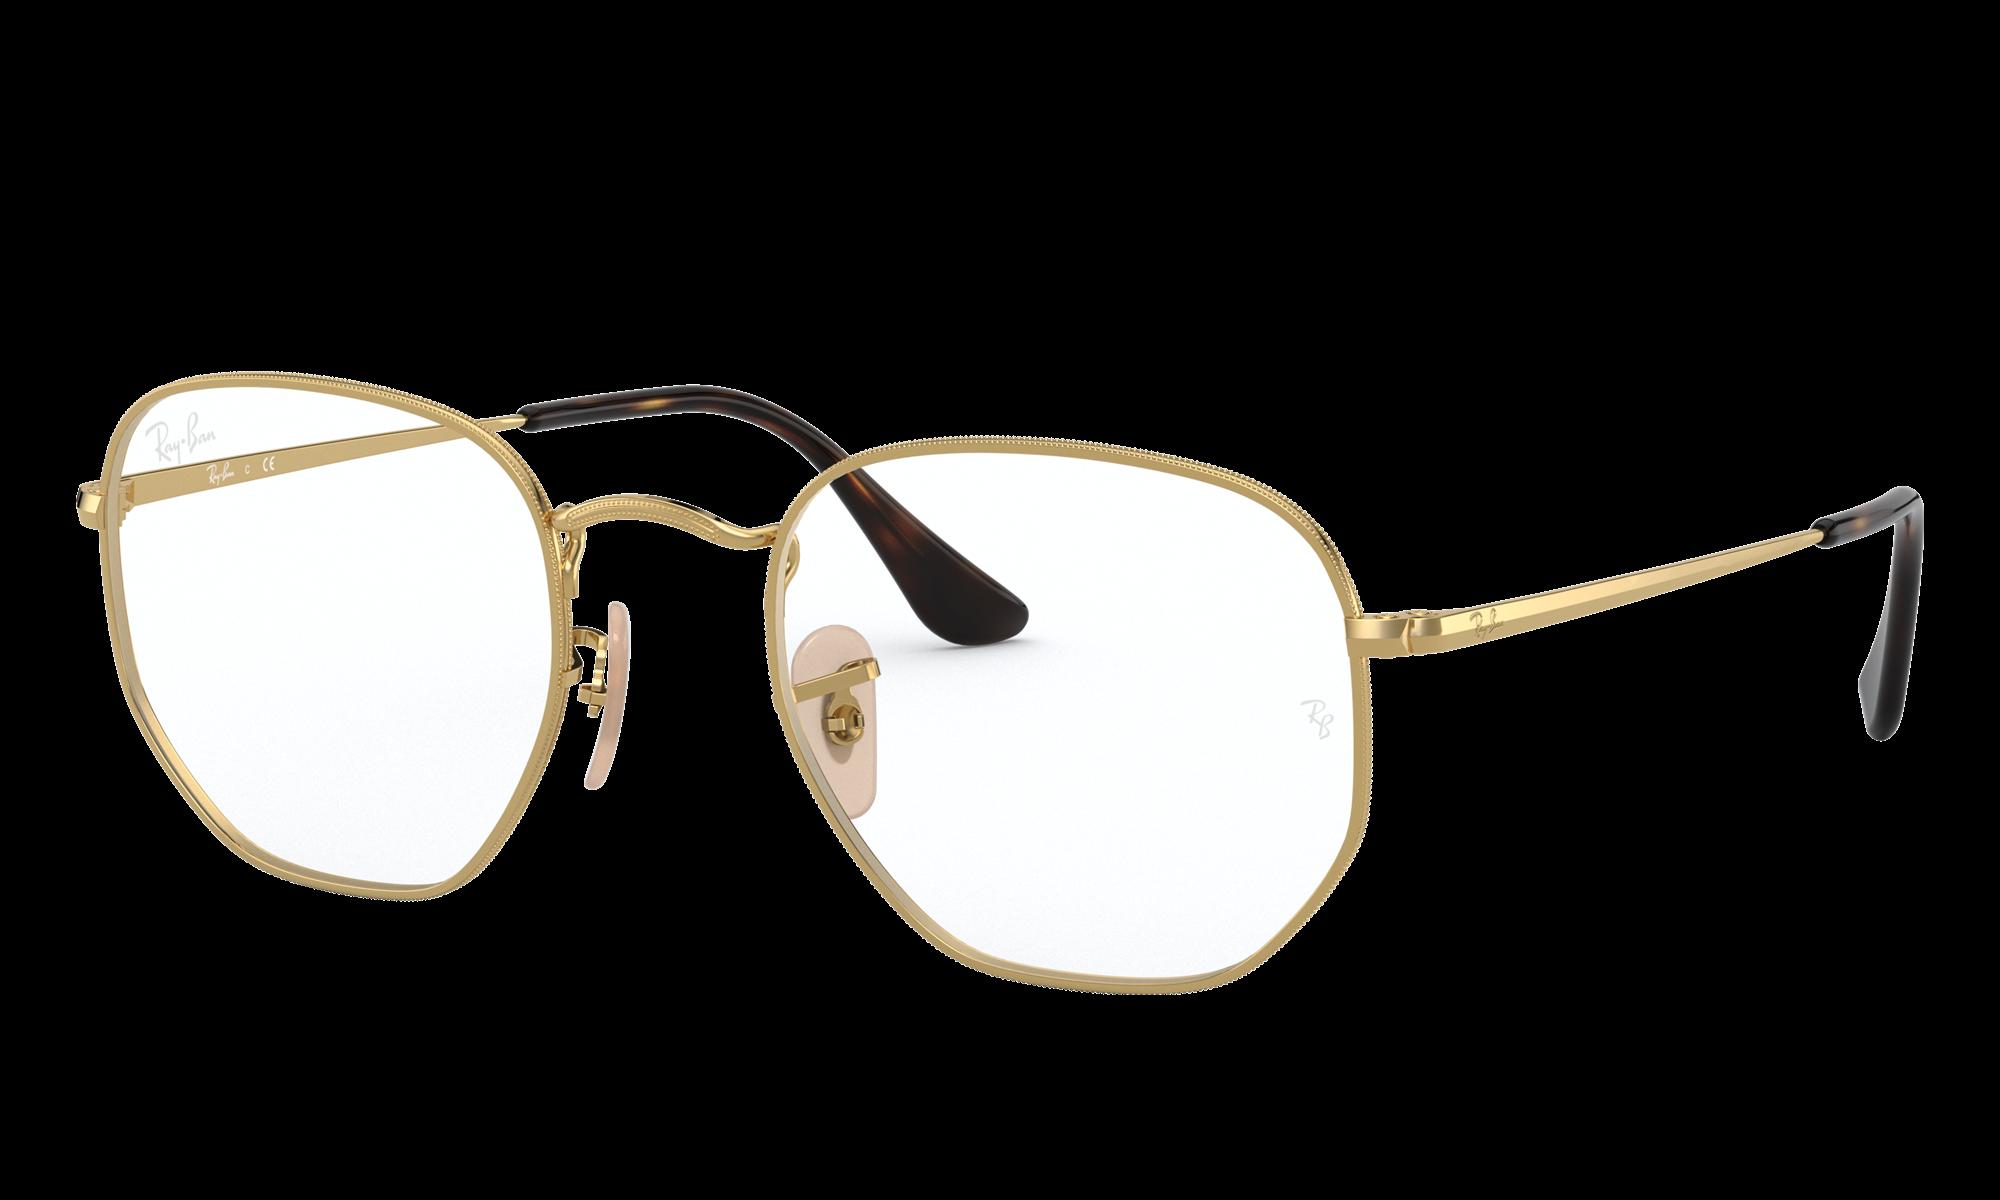 Retro Sunglasses | Vintage Glasses | New Vintage Eyeglasses Ray-Ban Unisex Hexagonal Optics Gold Size Standard $173.00 AT vintagedancer.com